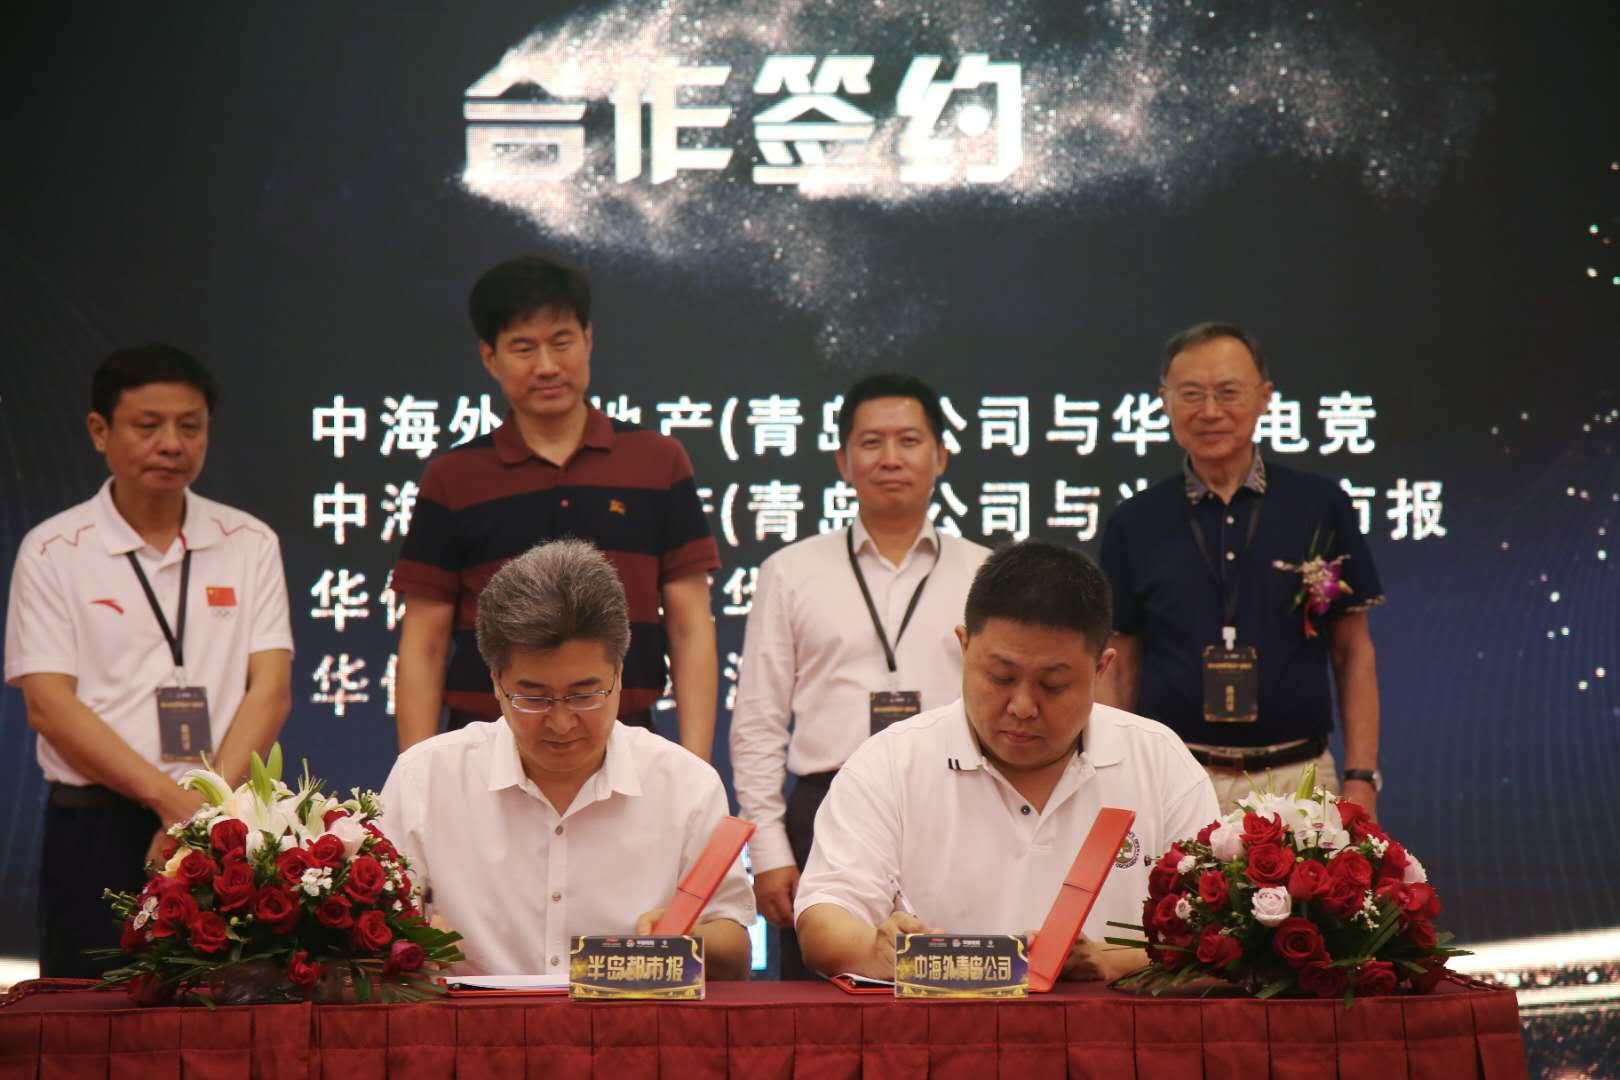 ESCC西海岸国际电竞产业峰会半岛都市报与中海外房地产(青岛)有限公司签约仪式。.jpg